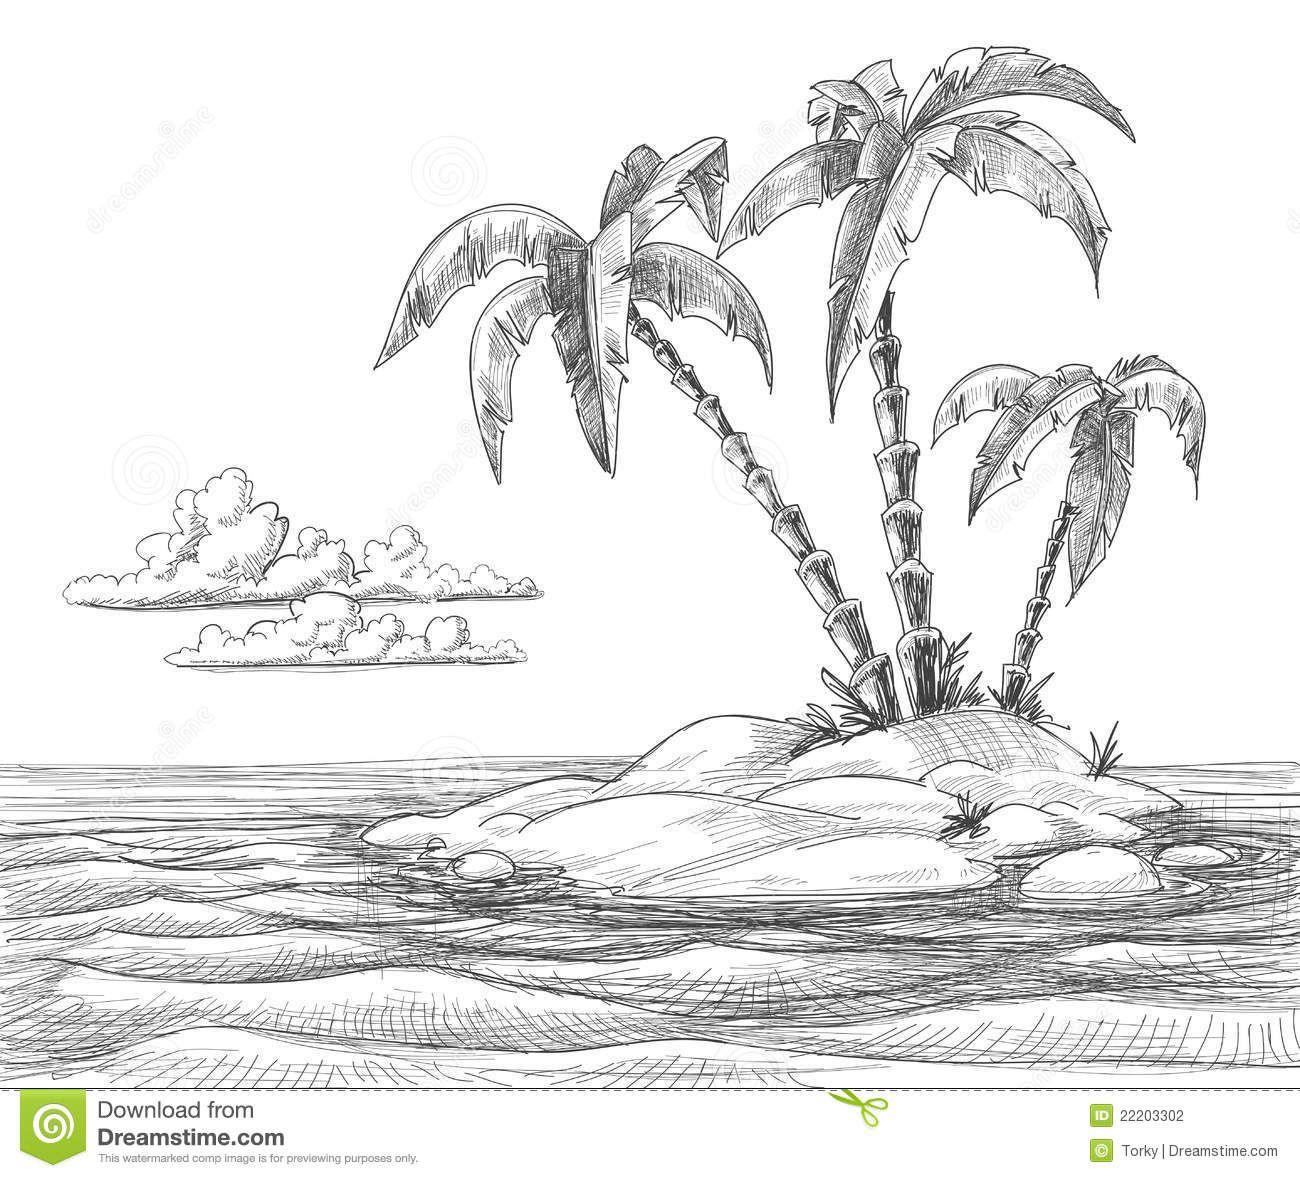 Ocean Landscape Pencil Drawings